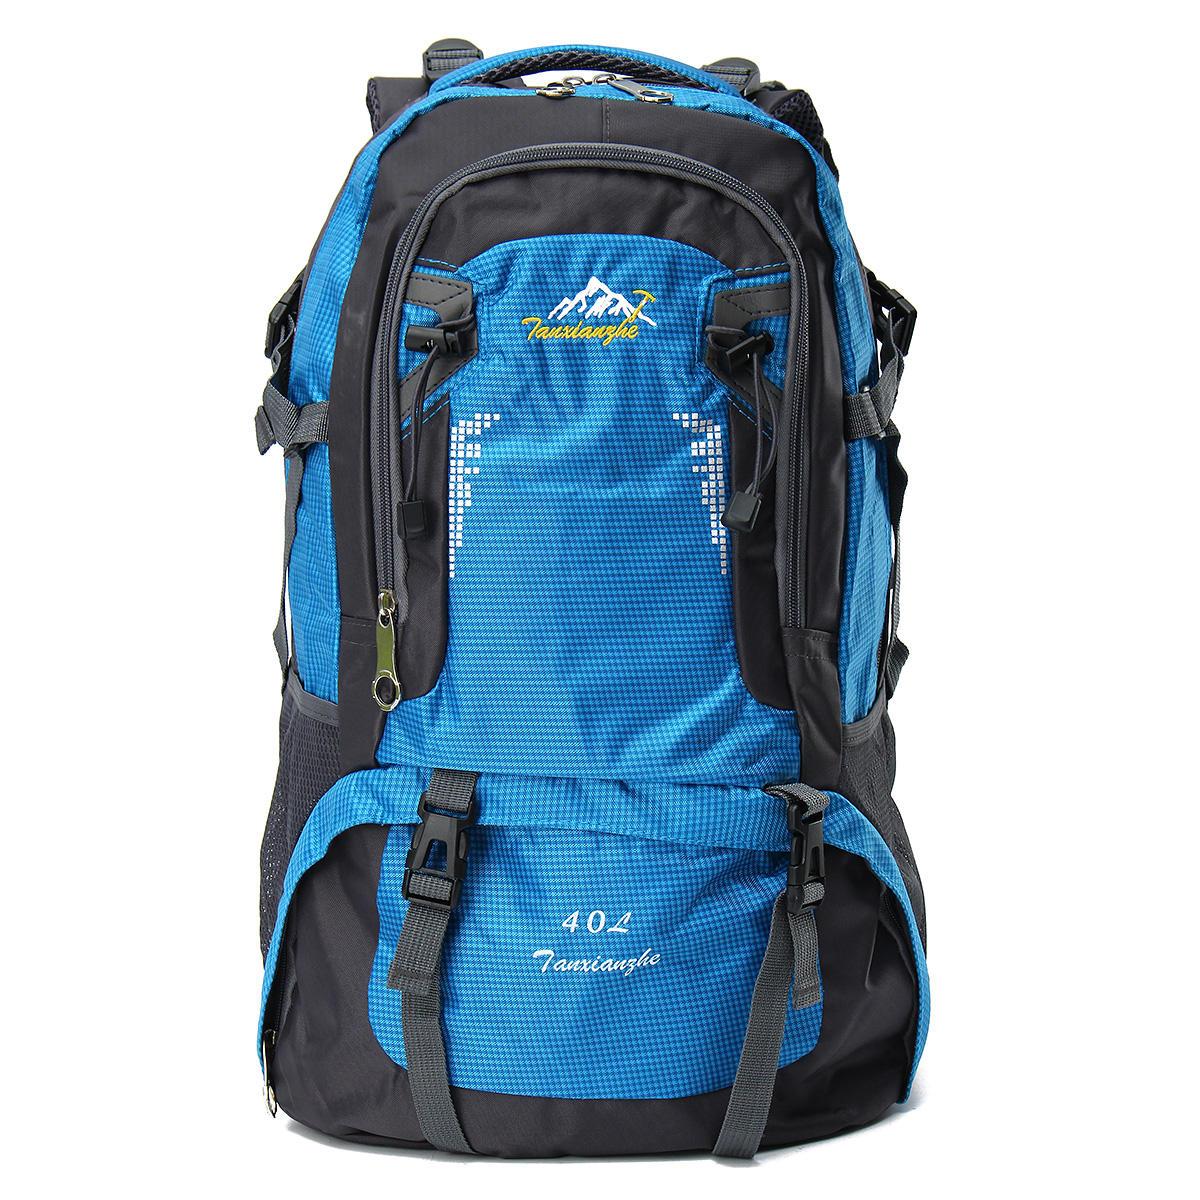 e721a819d8 IPRee 40L 60L Waterproof Outdoor Backpack Rucksack Sports Hiking Climbing  Travel Shoulder Bag Pack COD